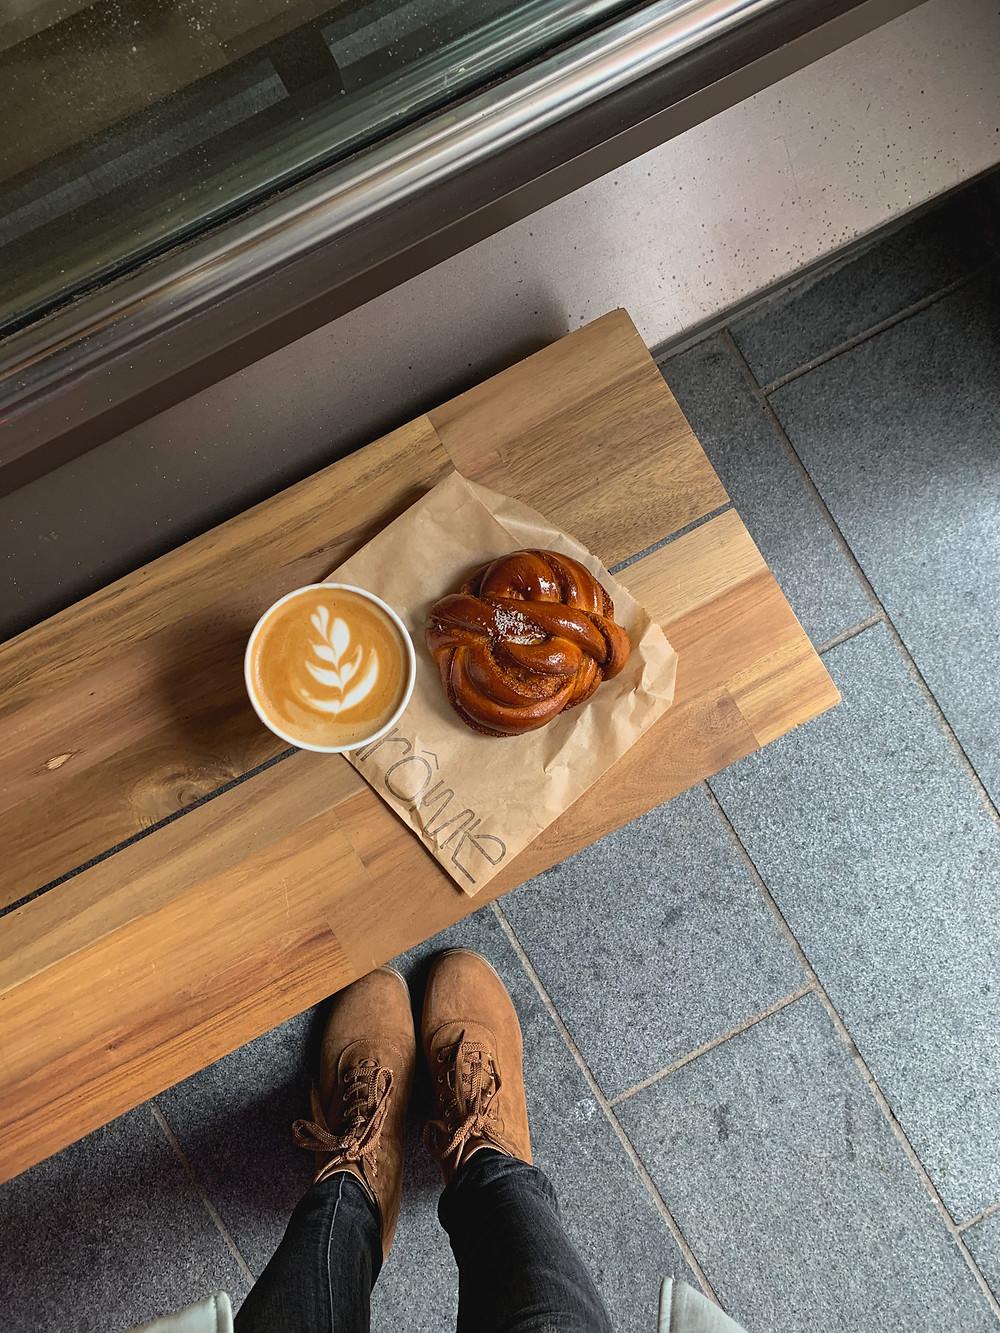 Latte and gula Melaka coconut roll at Arome Bakery, London | RollingBear Travels